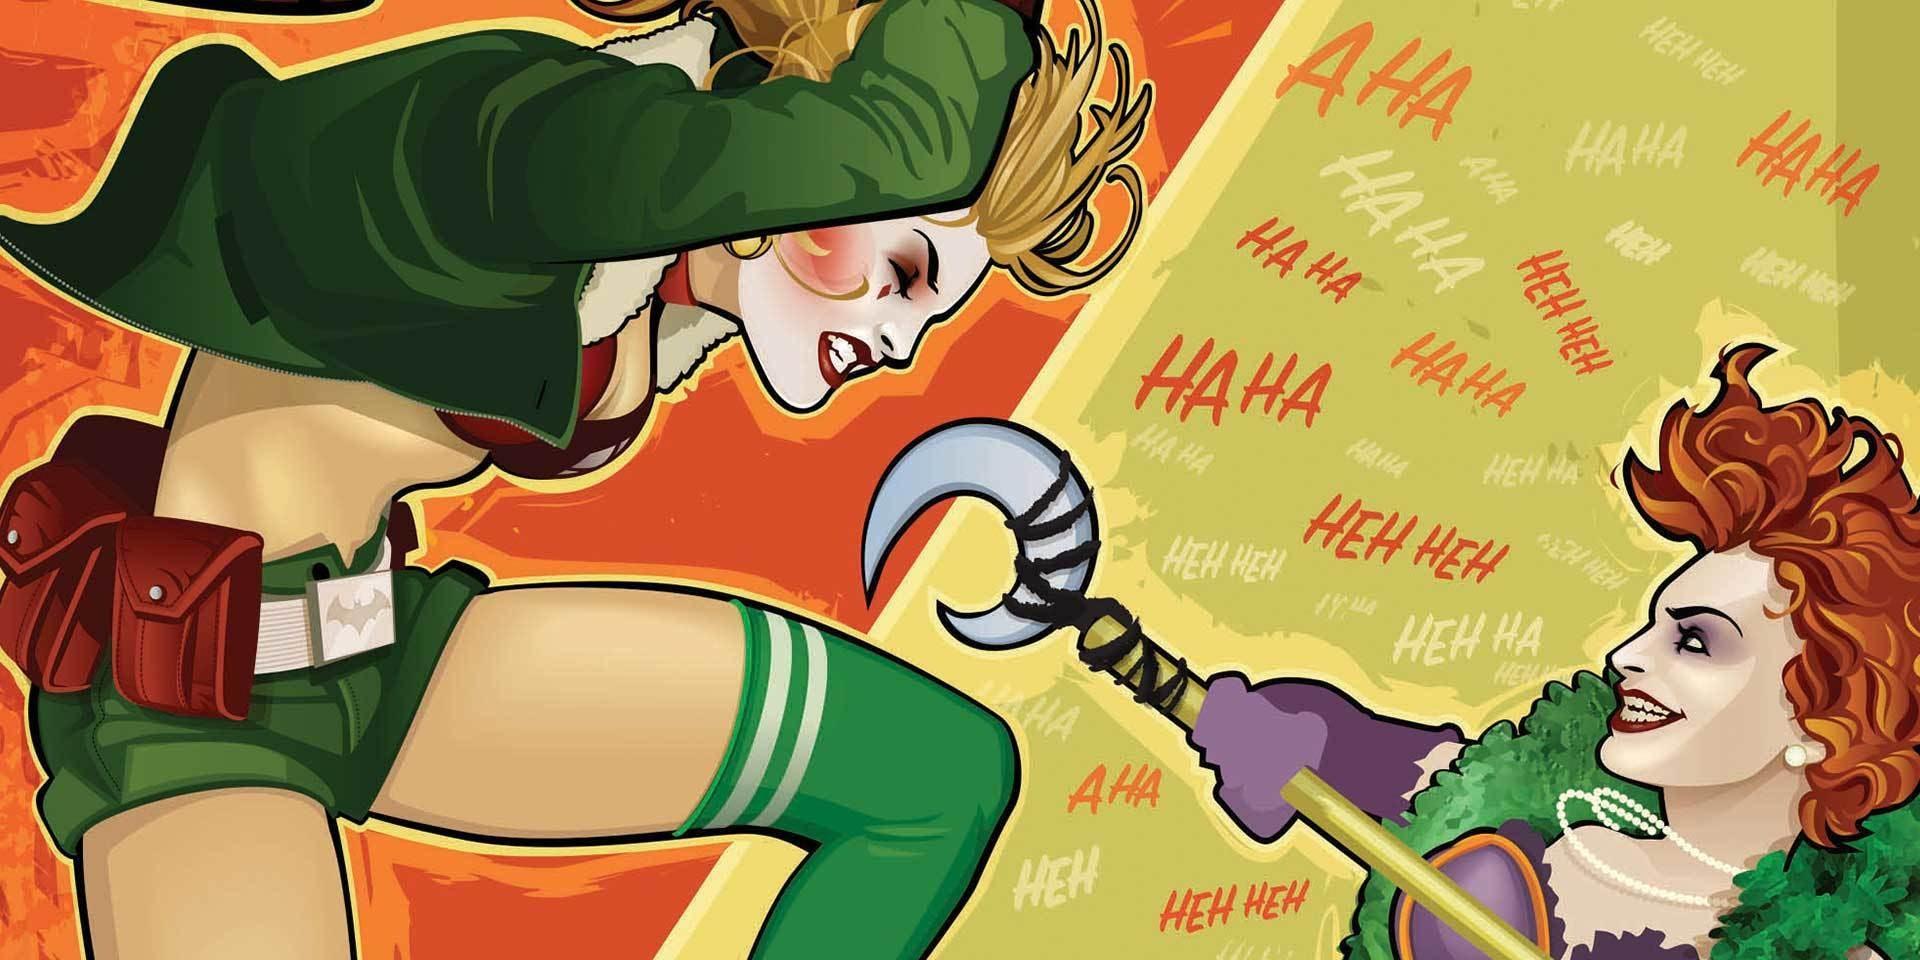 Harley strikes at Joker's daughter in 1940s Berlin.